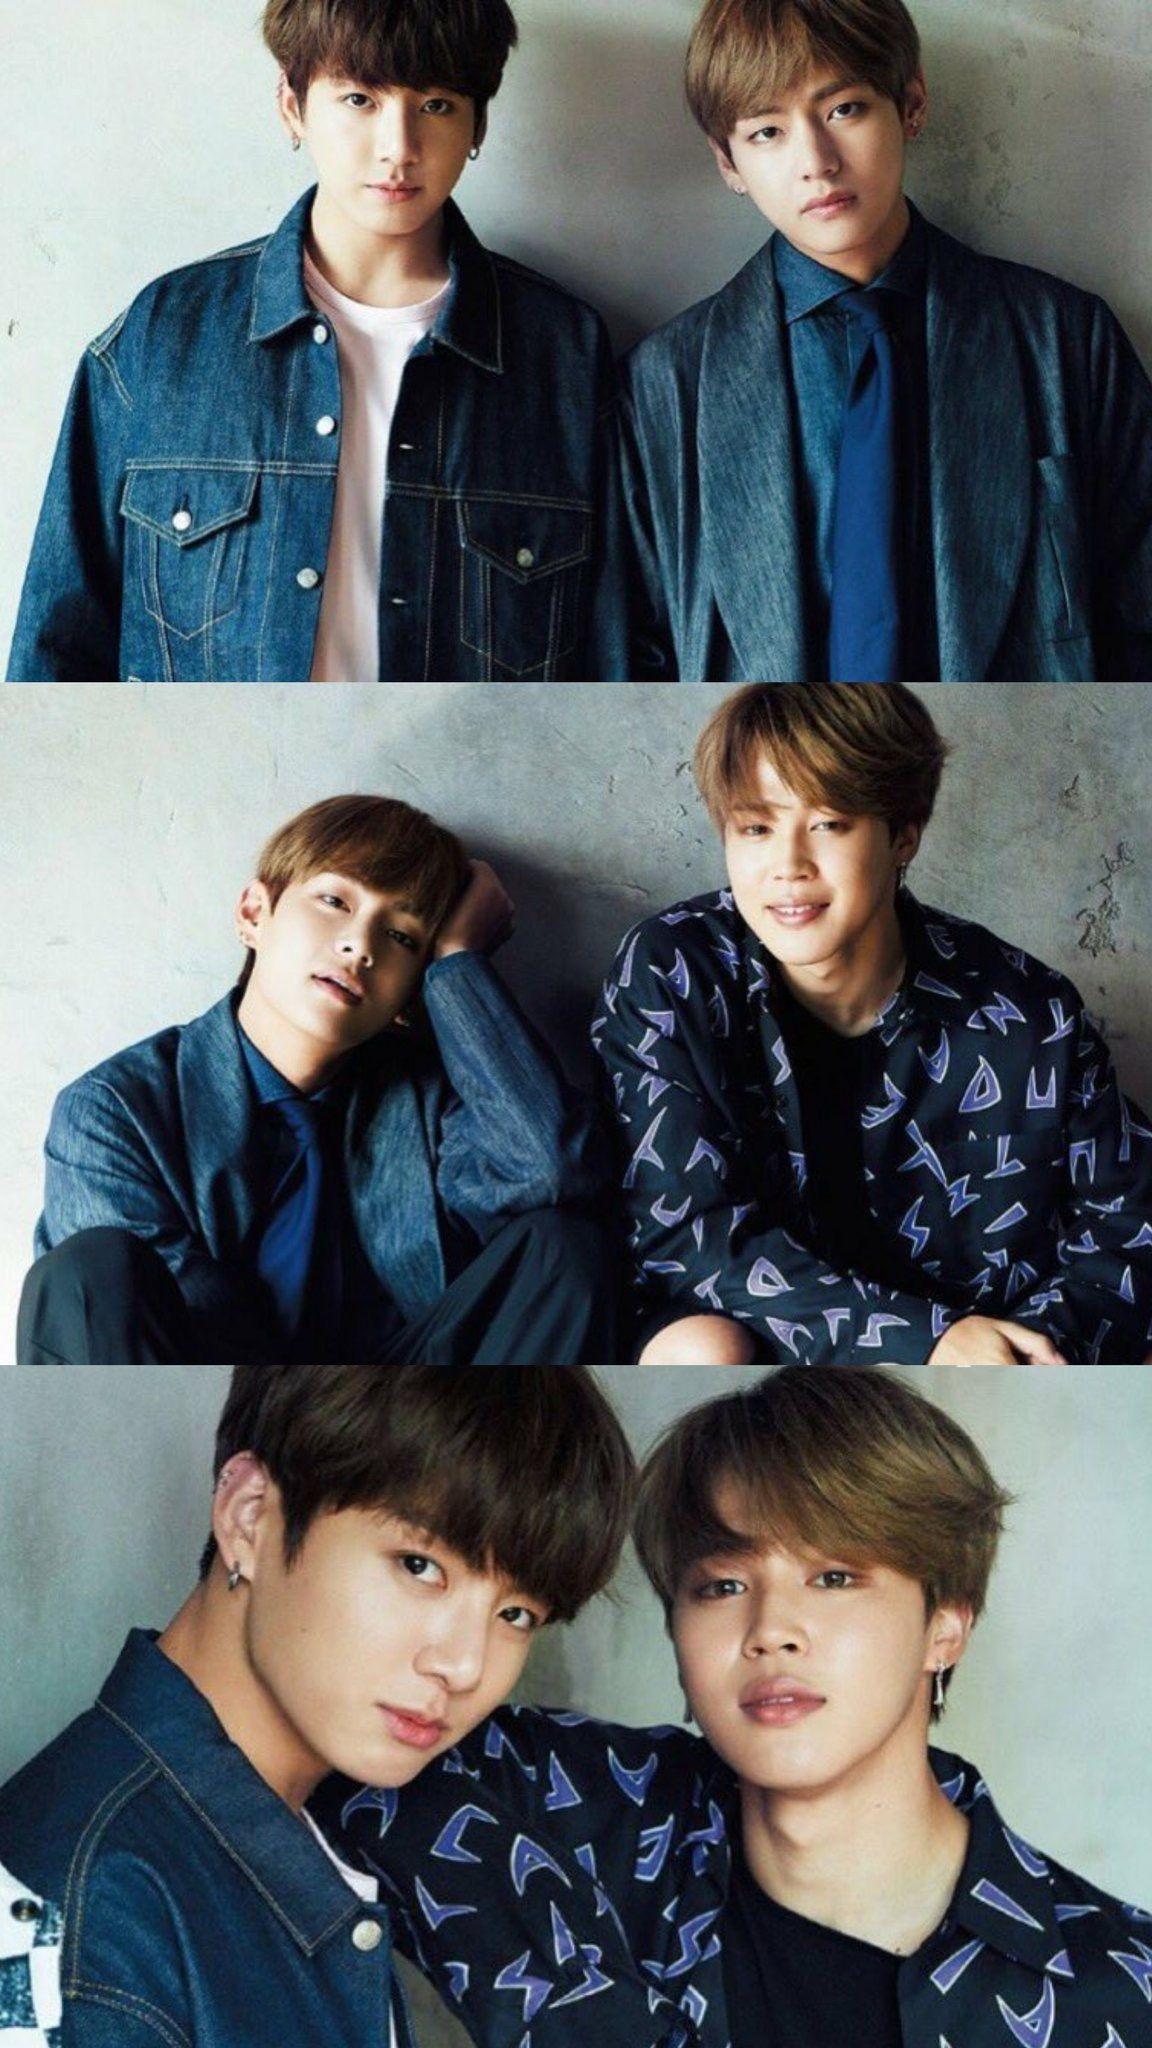 Pin By Adhe Aprillia Bts On Favoritas Bts Korea Bts Maknae Line Bts Boys